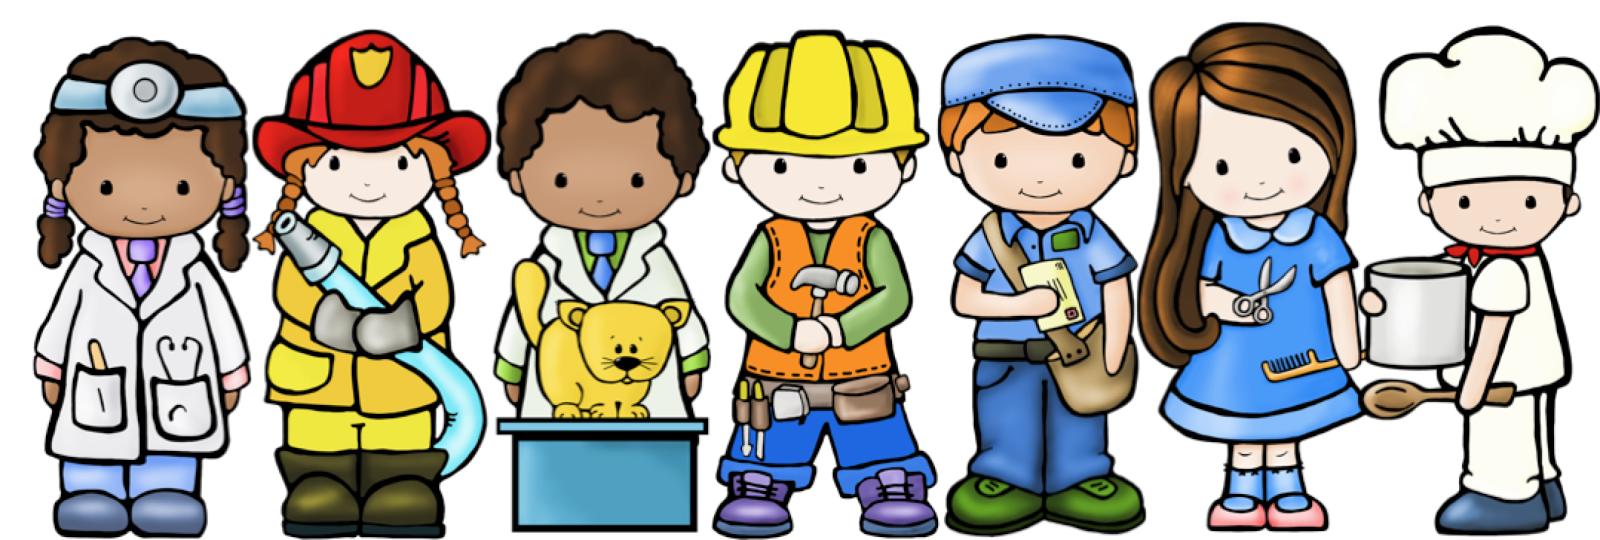 Careers clipart community helper. School events helpers related